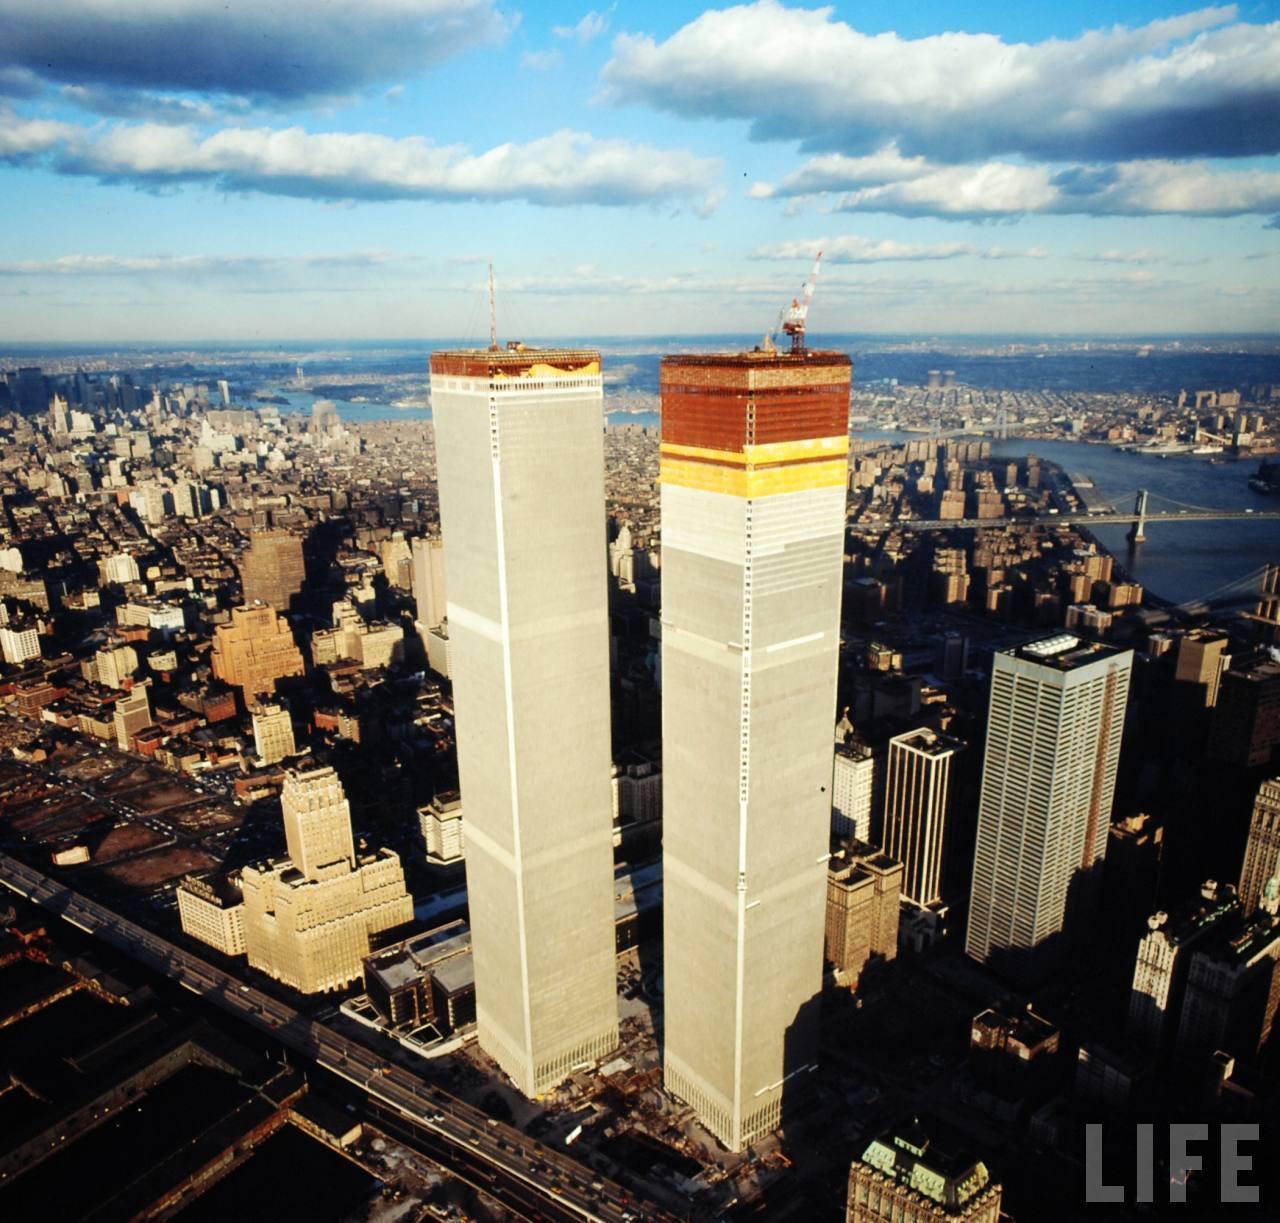 World Trade Center Construction : Stunning photographs captured the world trade center under